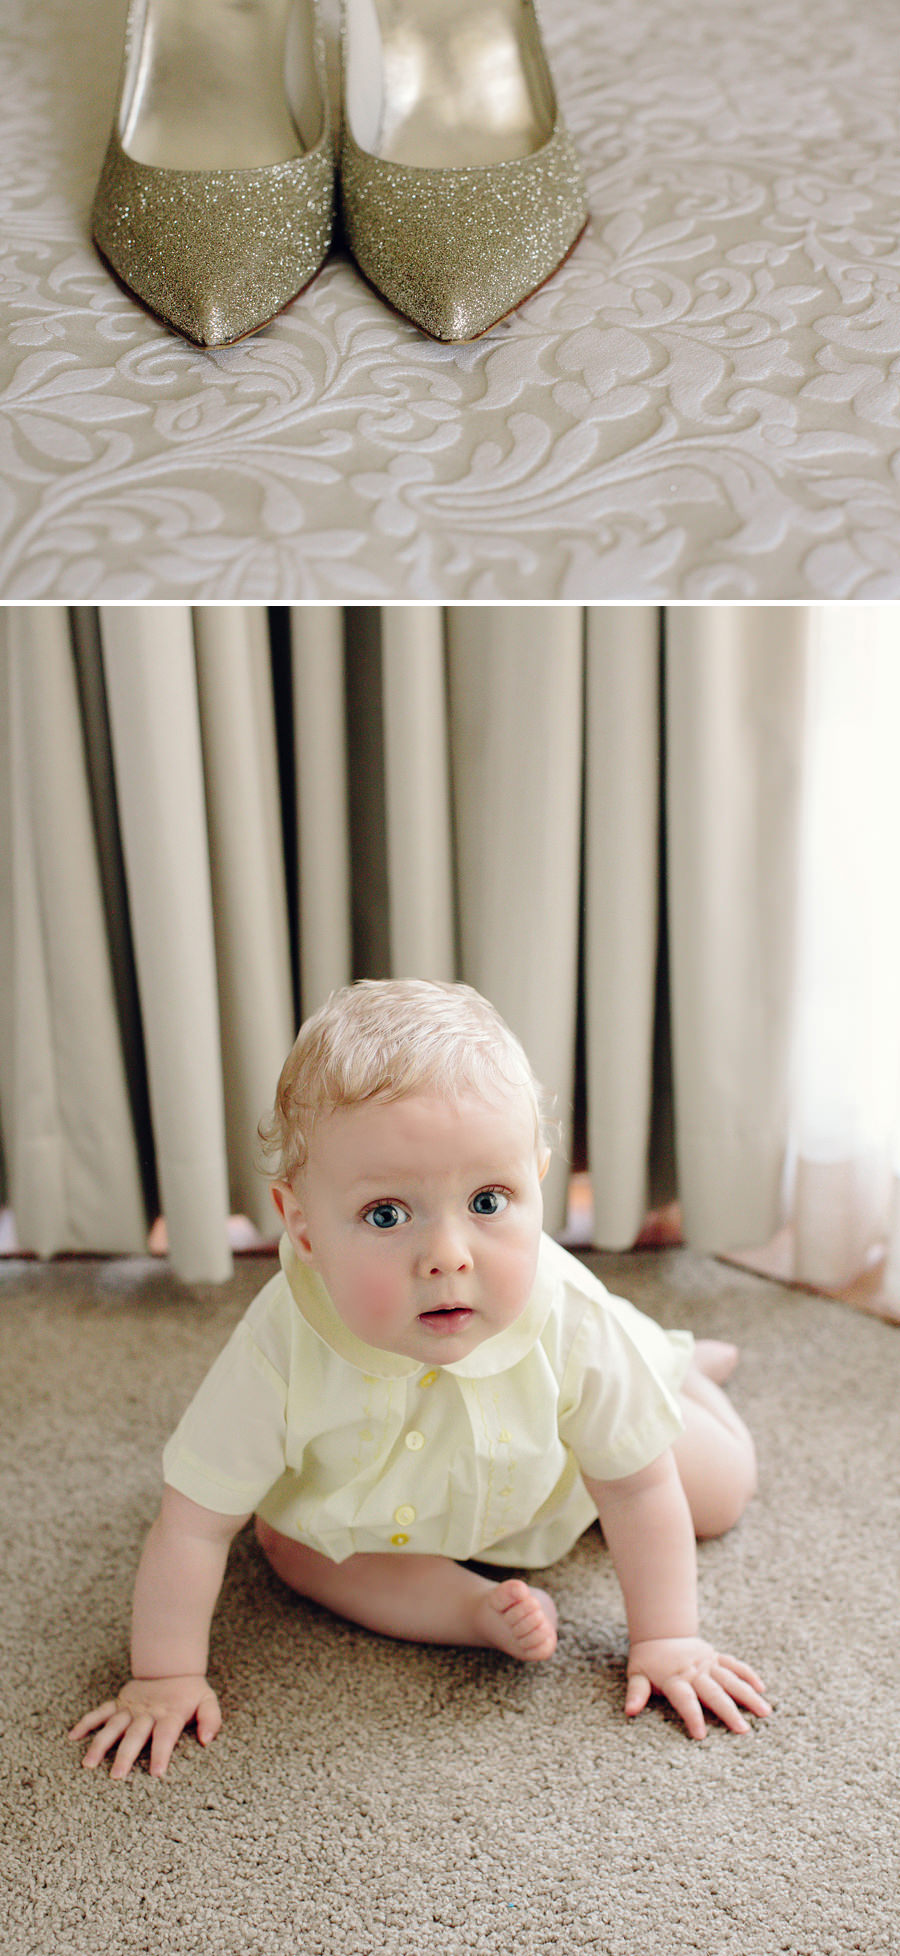 Cudal Wedding Photography: Stuart Weitzman